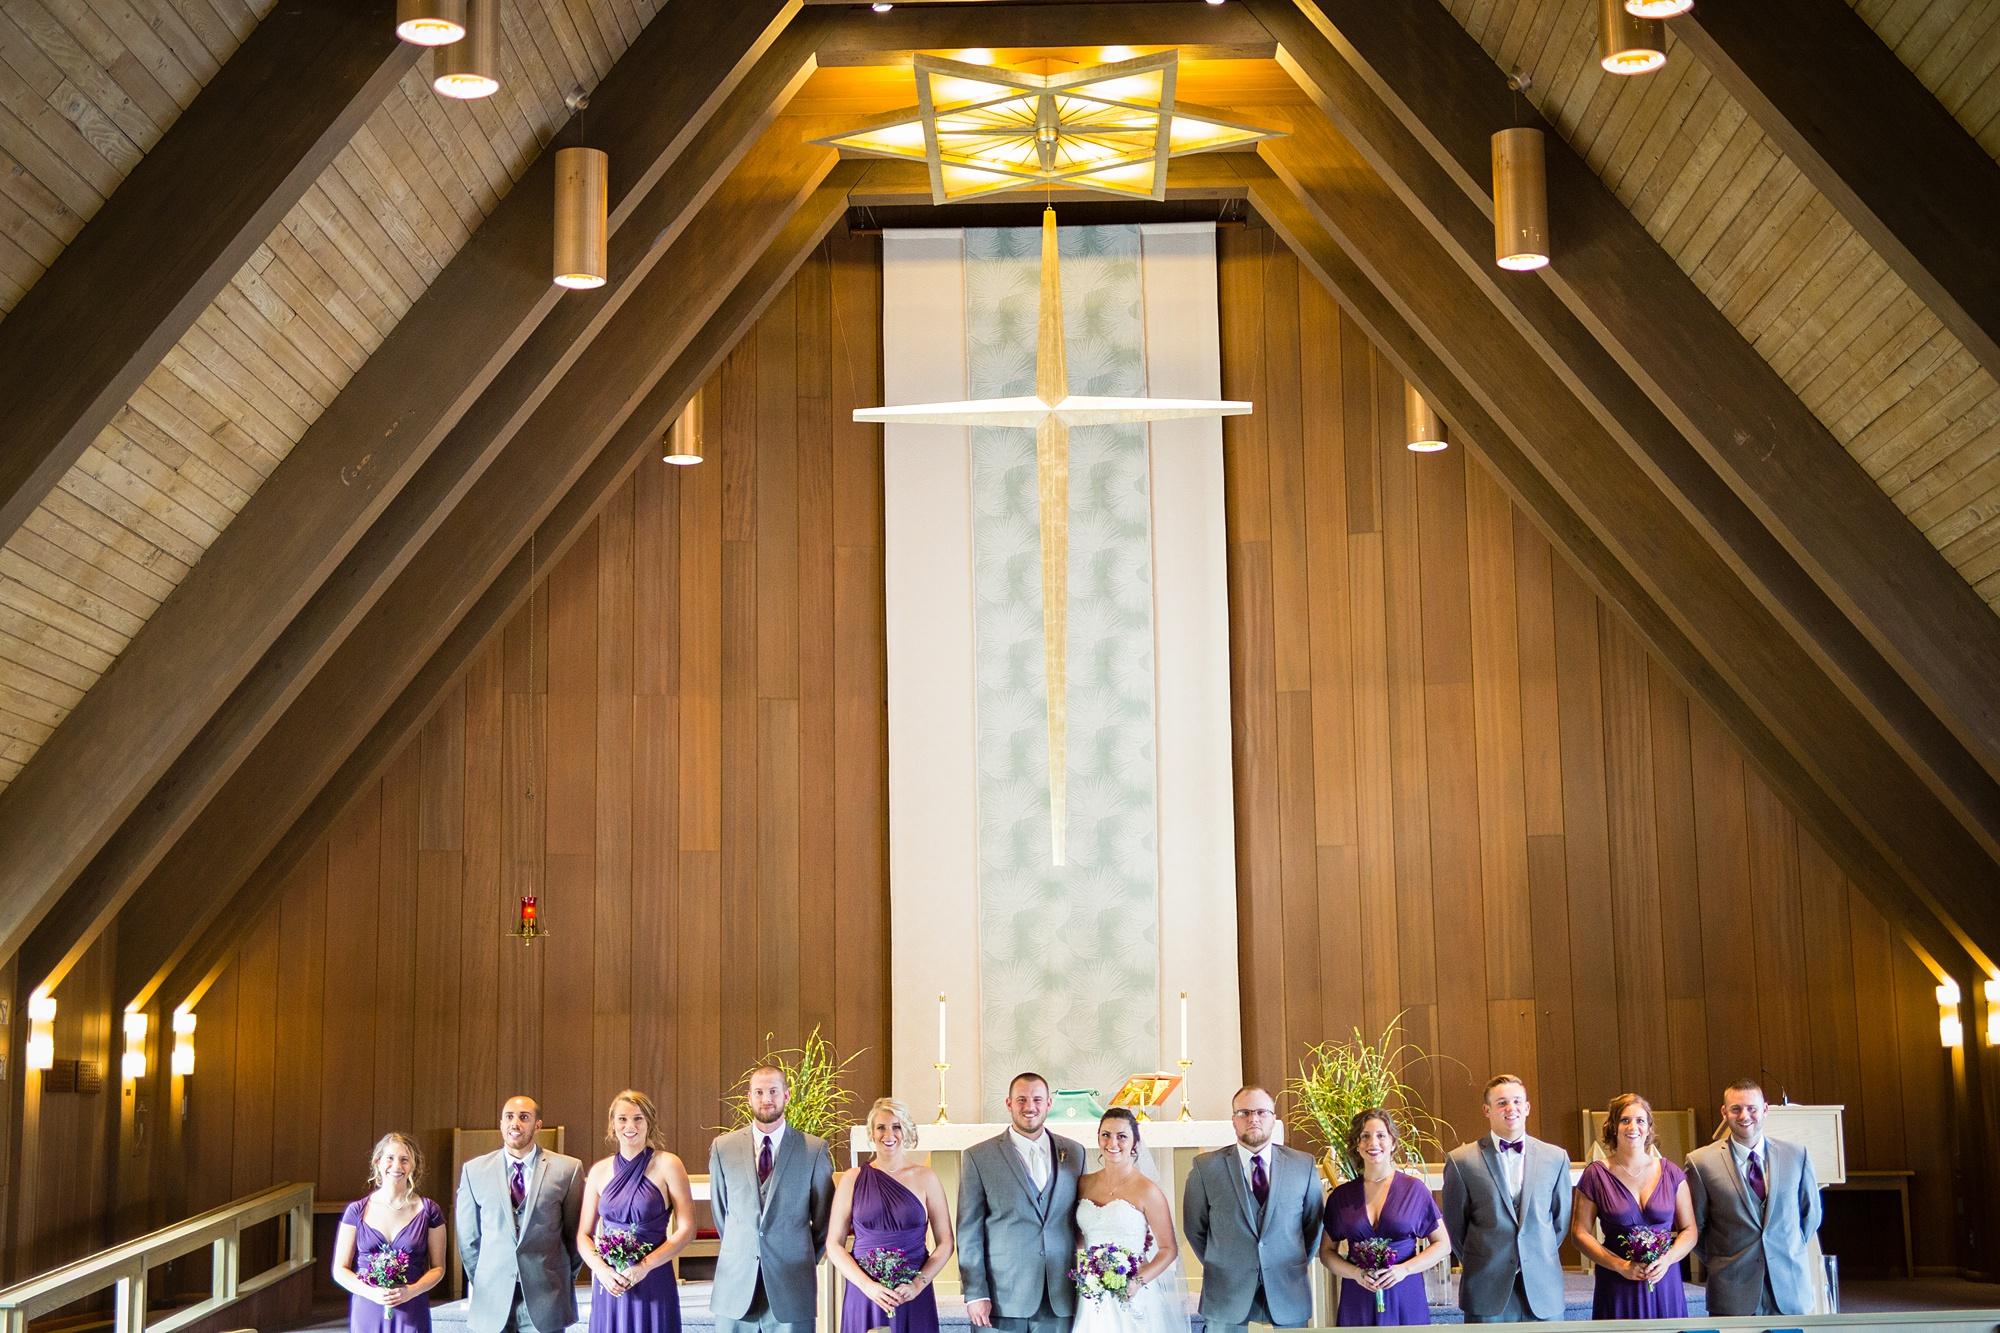 Brandon_Shafer_Photography_Emily_Travis_Kalamazoo_Wedding_Photography_0029.jpg